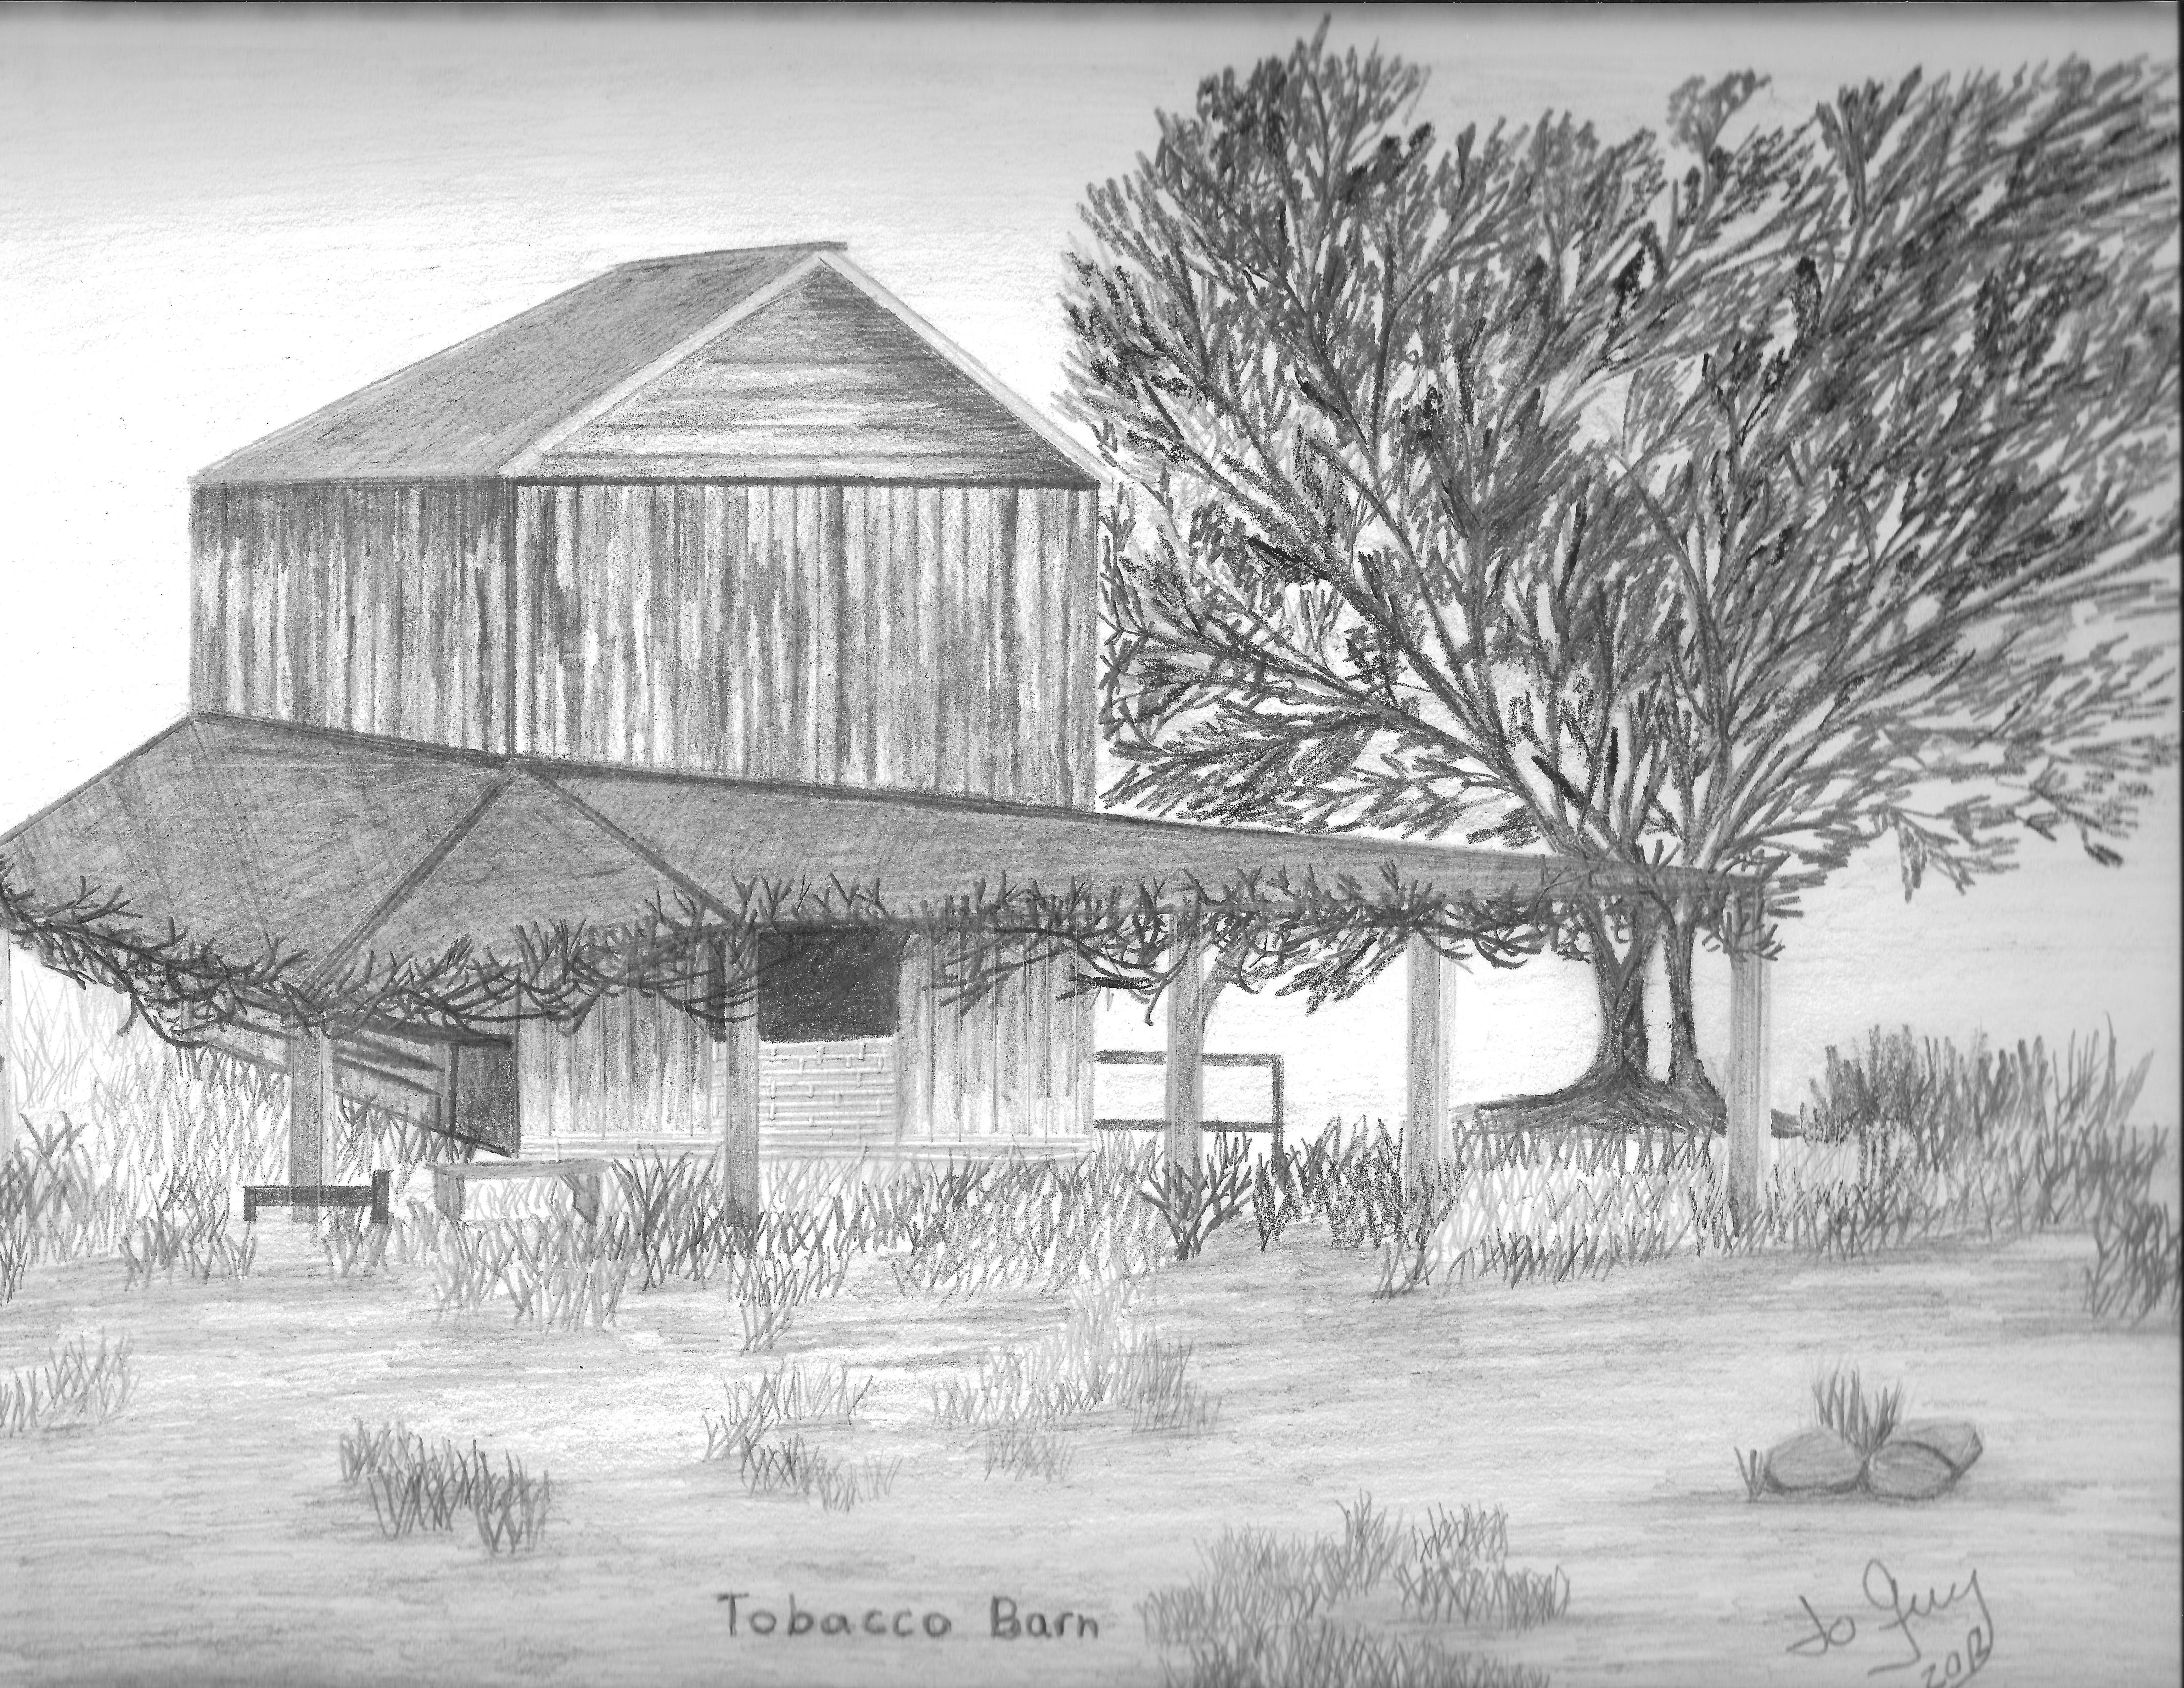 Old tobacco barn in nc barn drawing rustic barn old barns pencil drawings